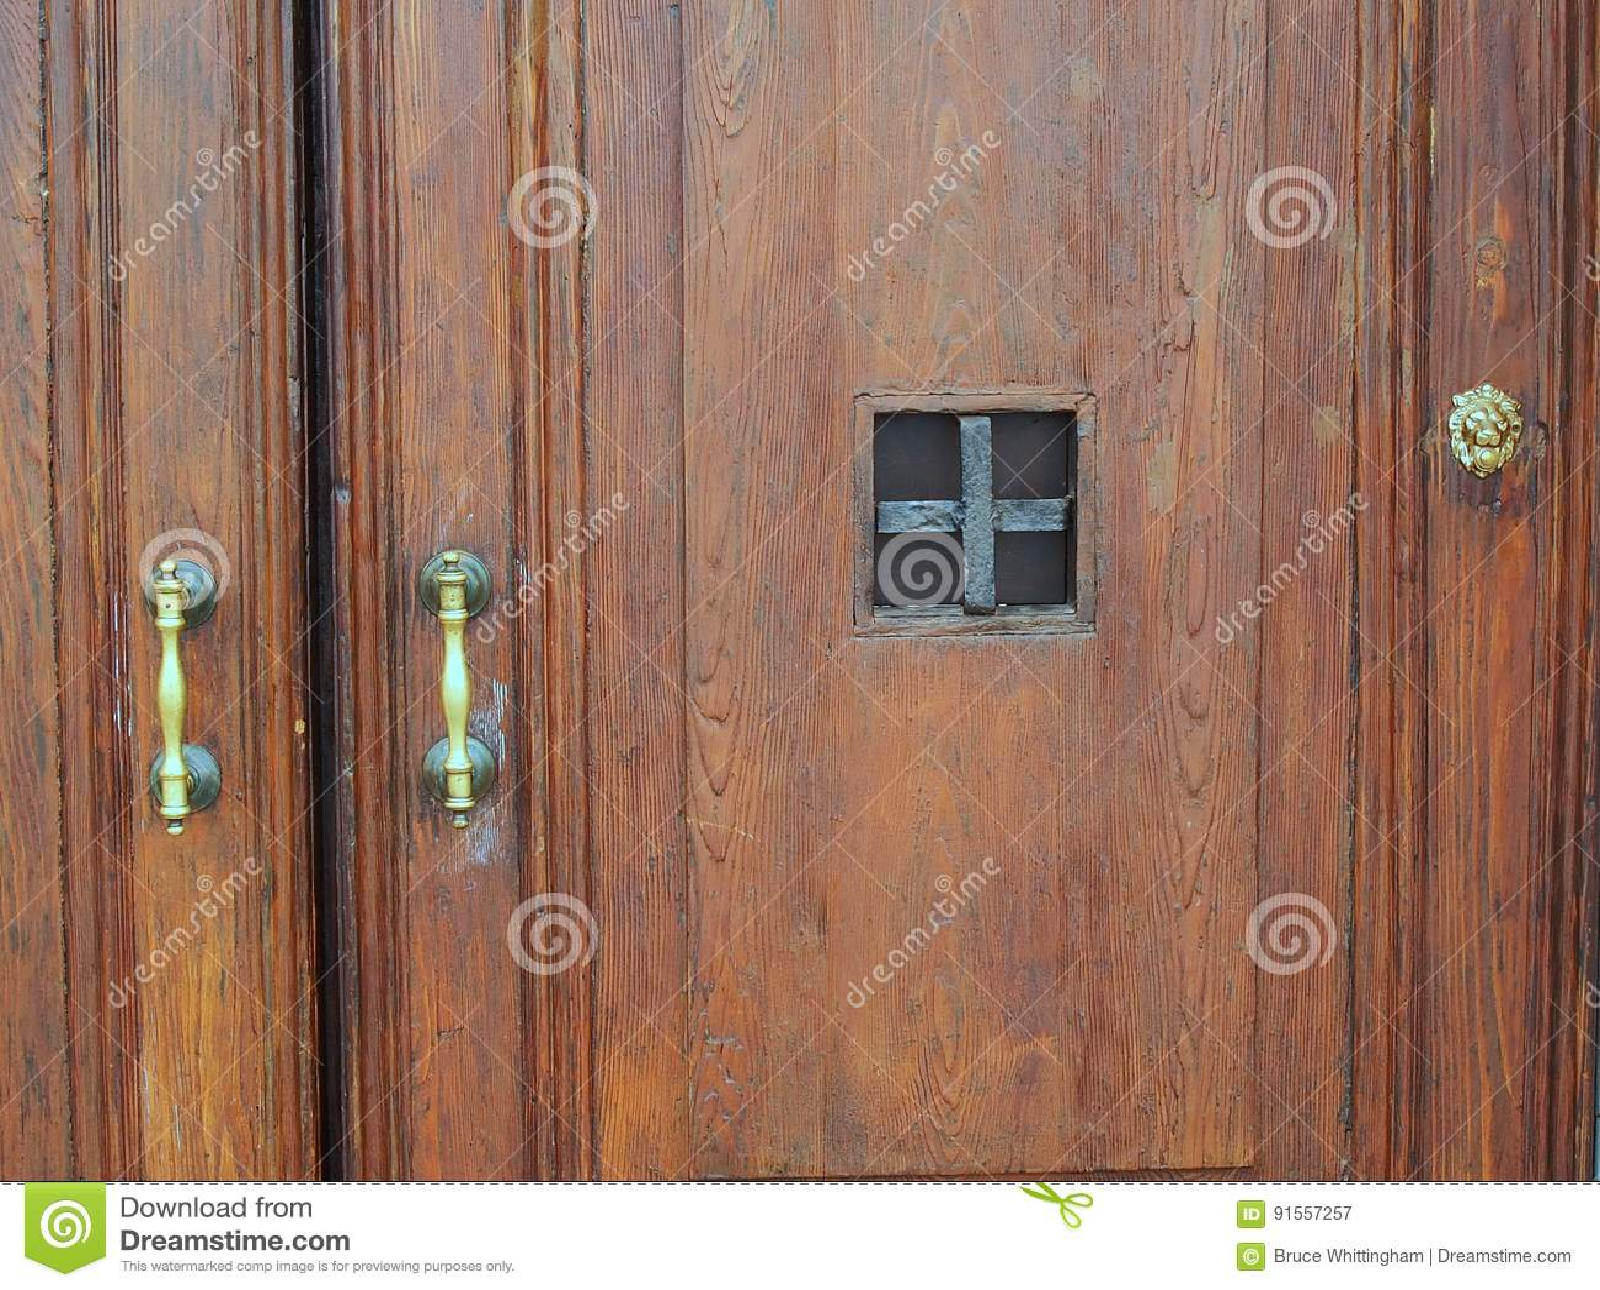 Brass Handles On Old Heavy Wooden Doors Stock Photo - Image: 91557257